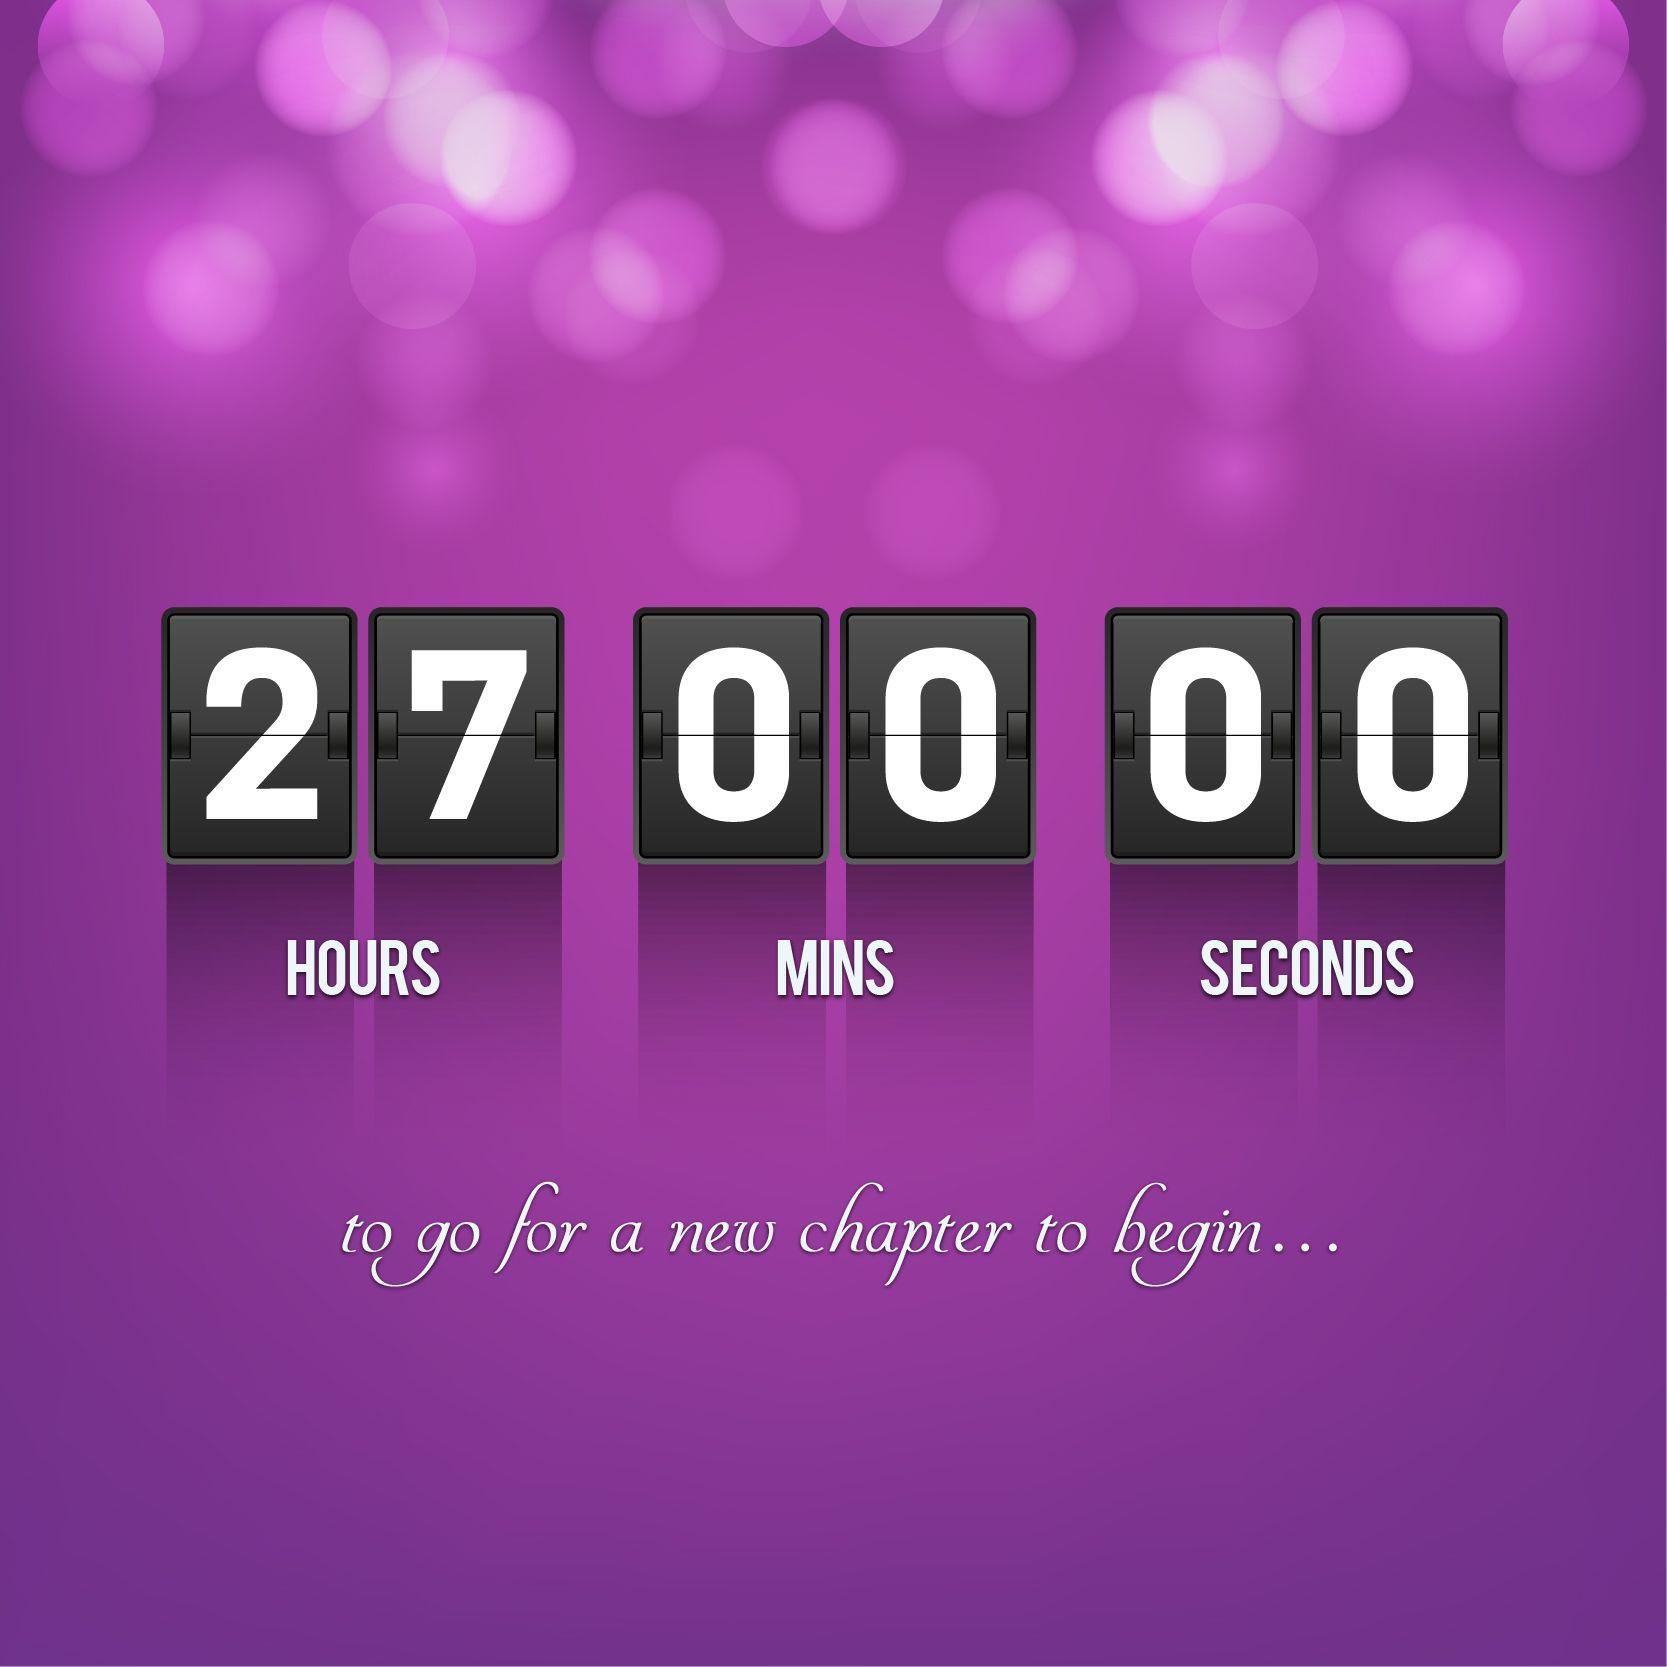 And the countdown has begun #alhuzaifa #newyear #happynewyear2016